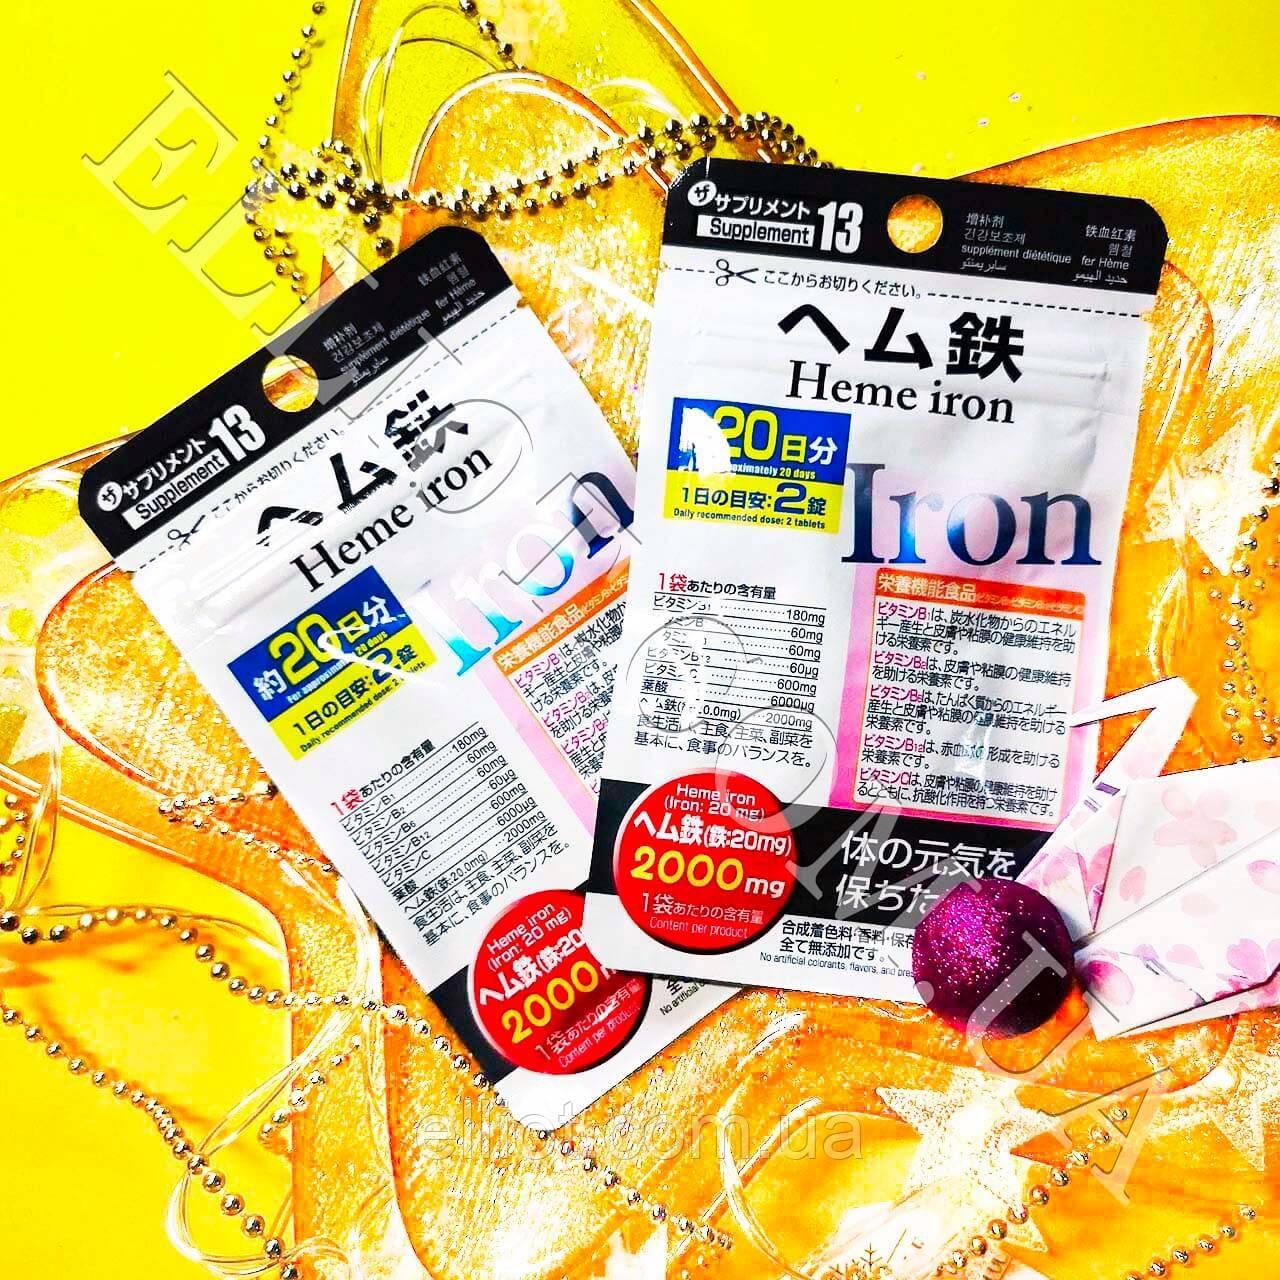 Гем Железо Heme Iron +Витамины Биодобавка Daiso Япония